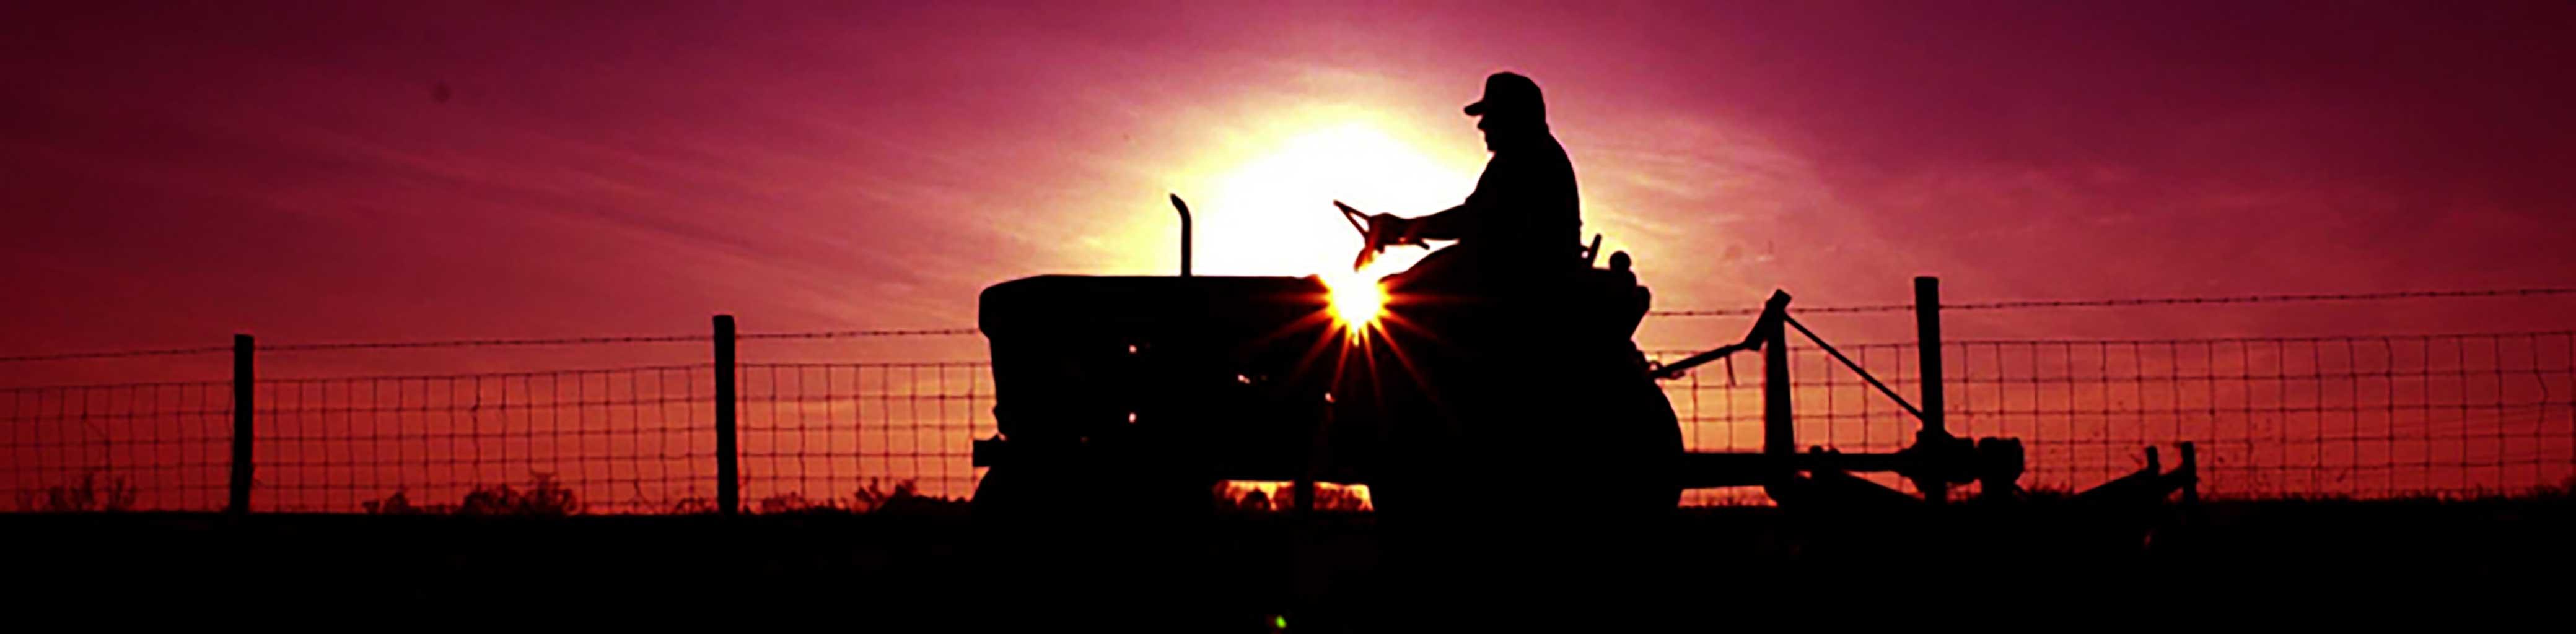 chuckatuck-farmer-robert-taylor-jhsii